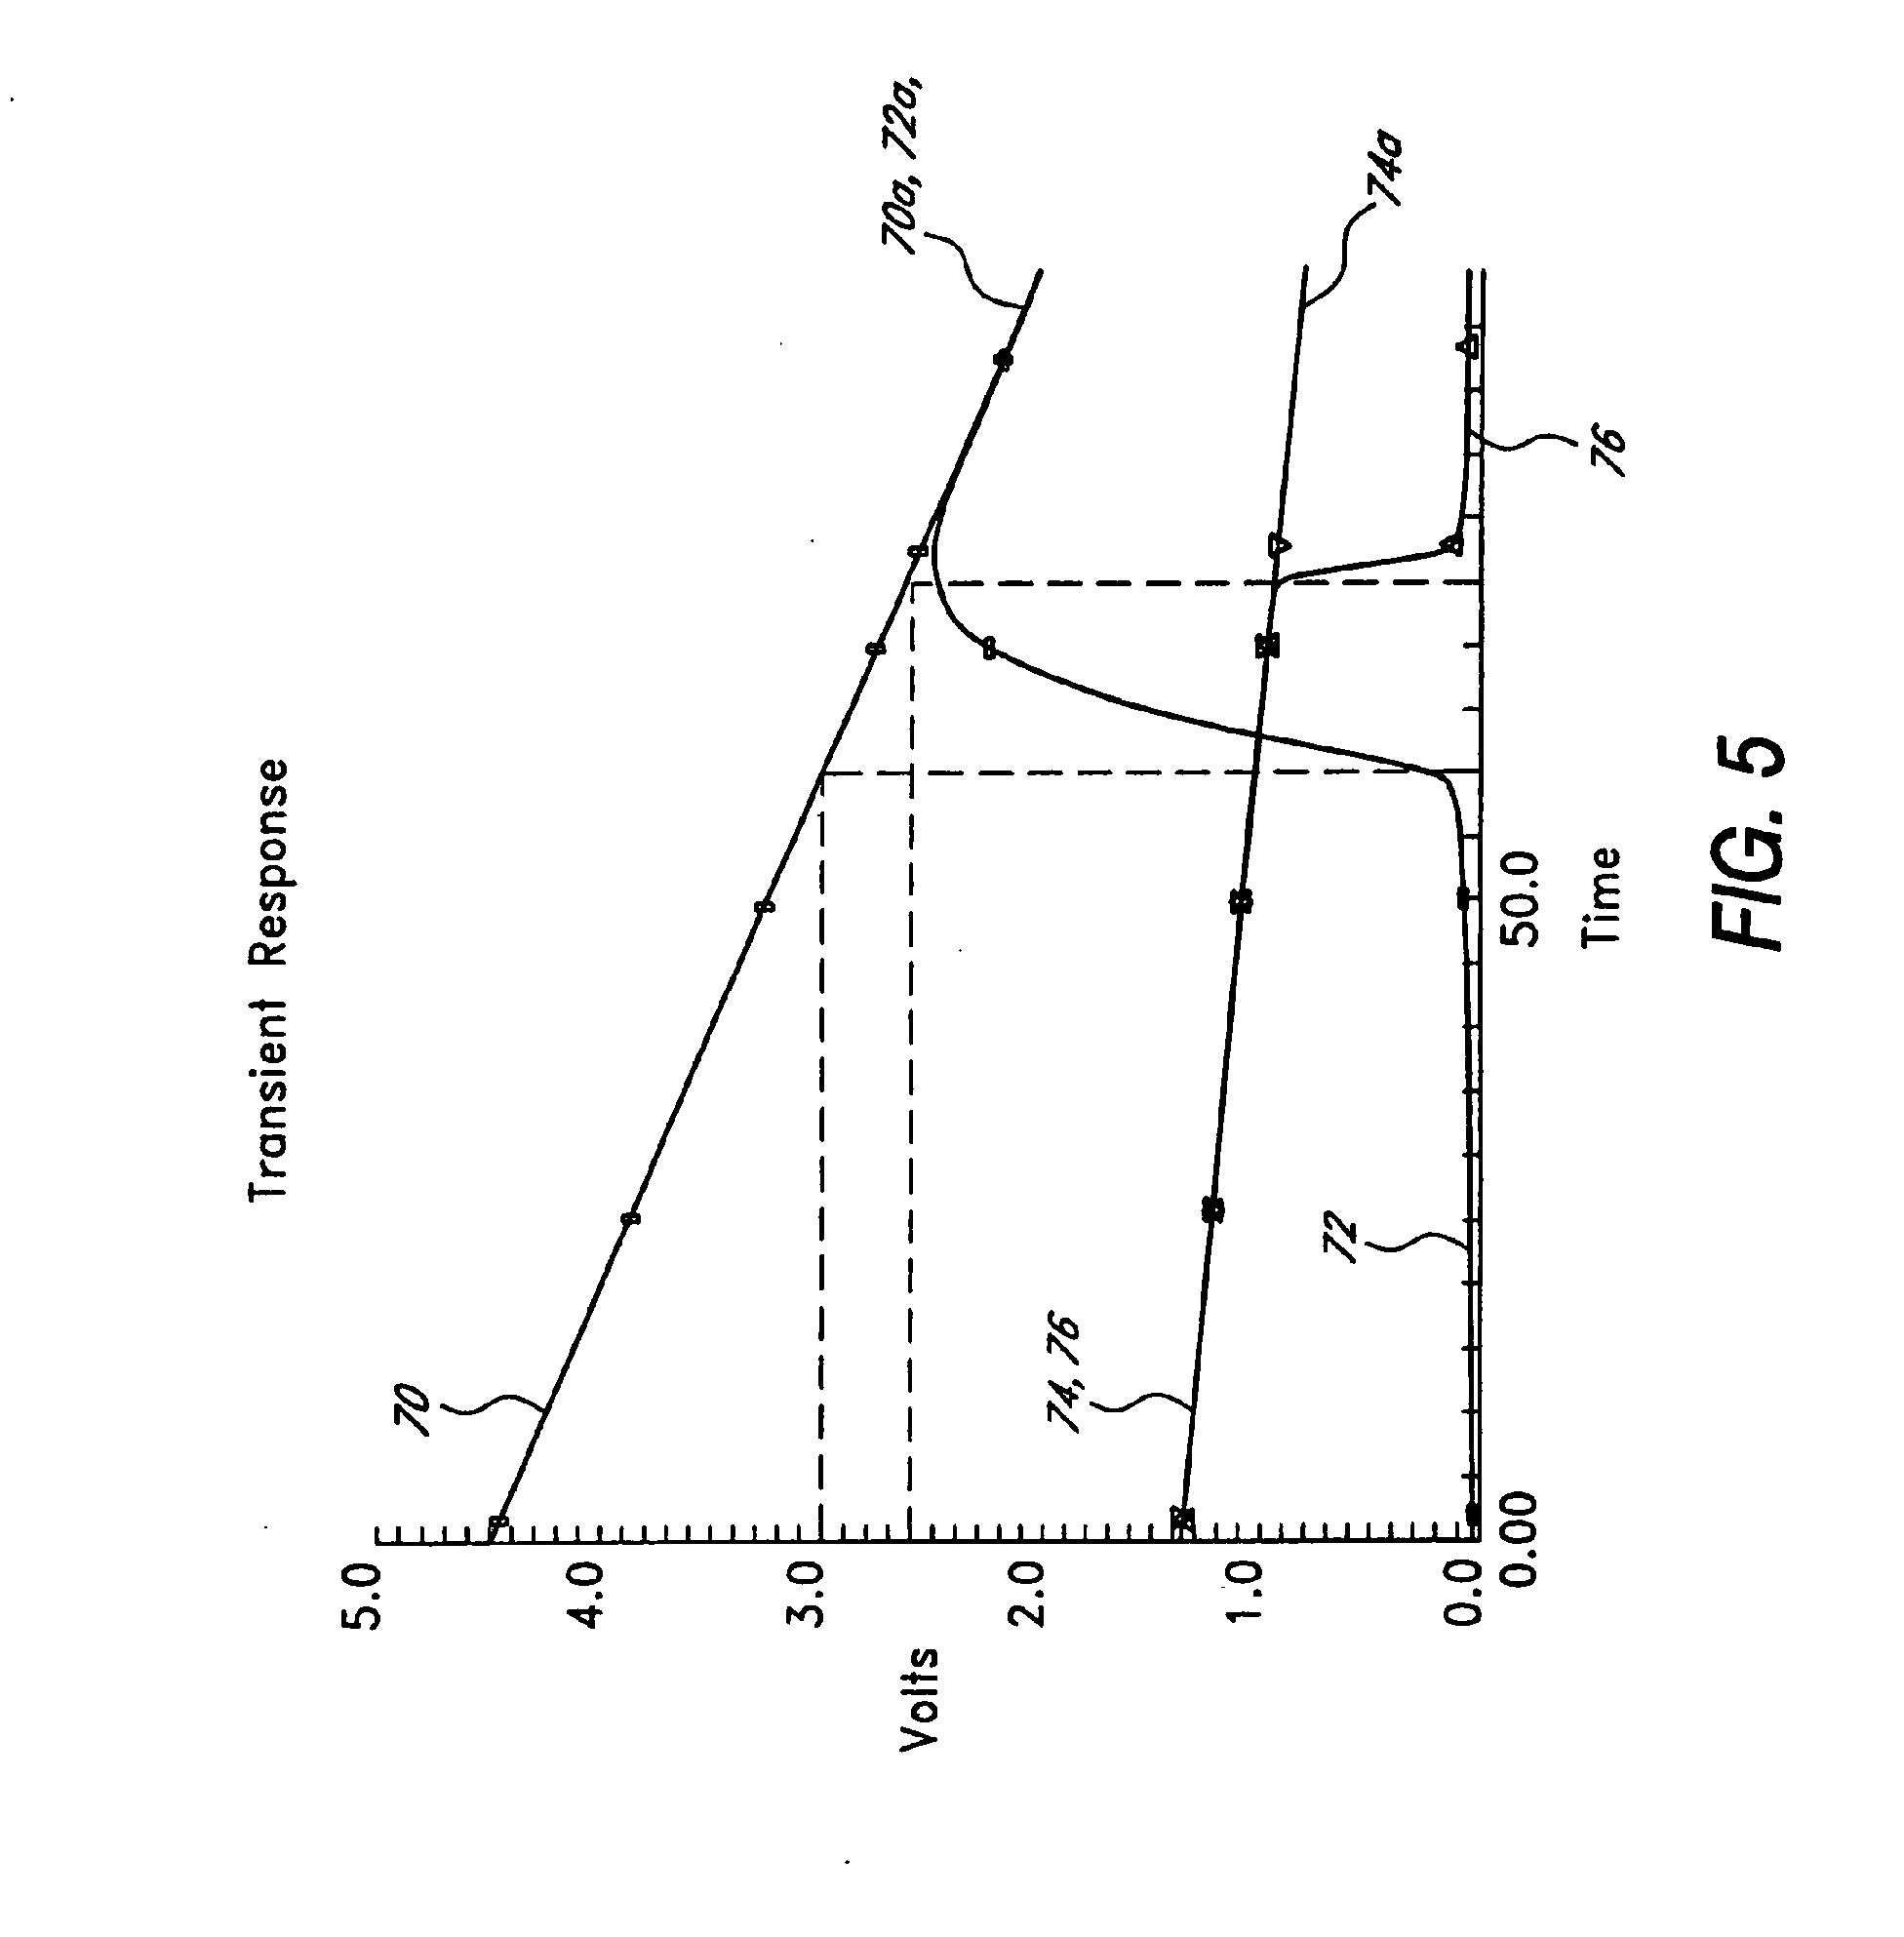 patent ep1282340a2